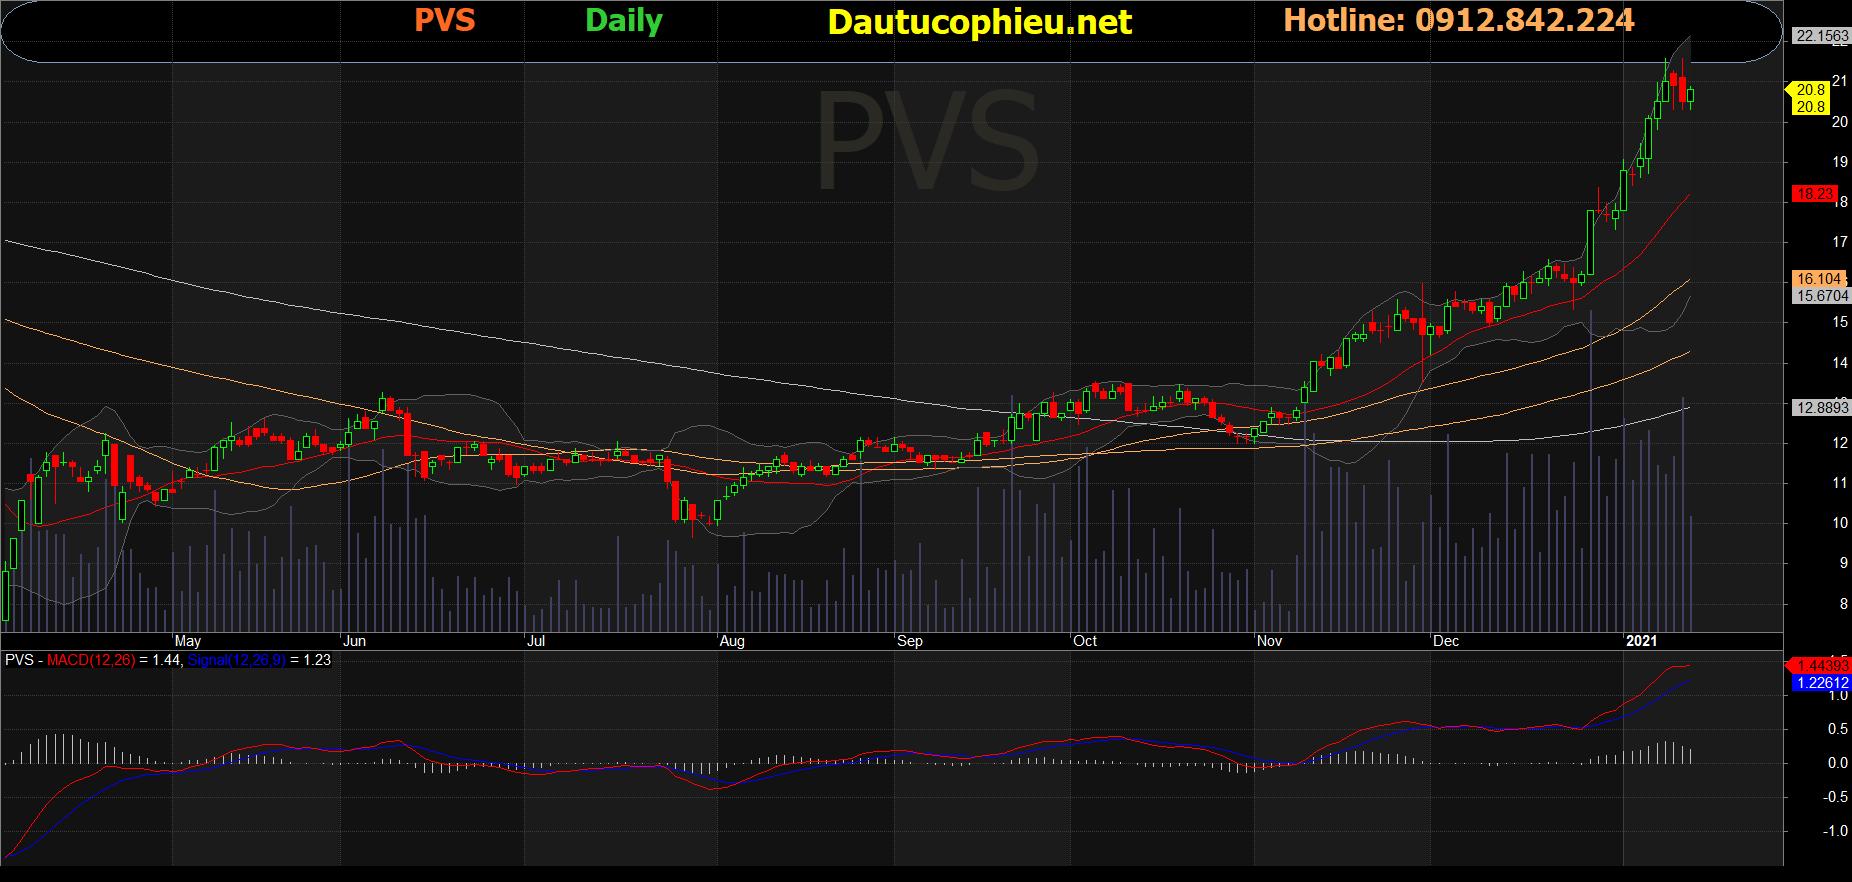 Cổ phiếu PVS